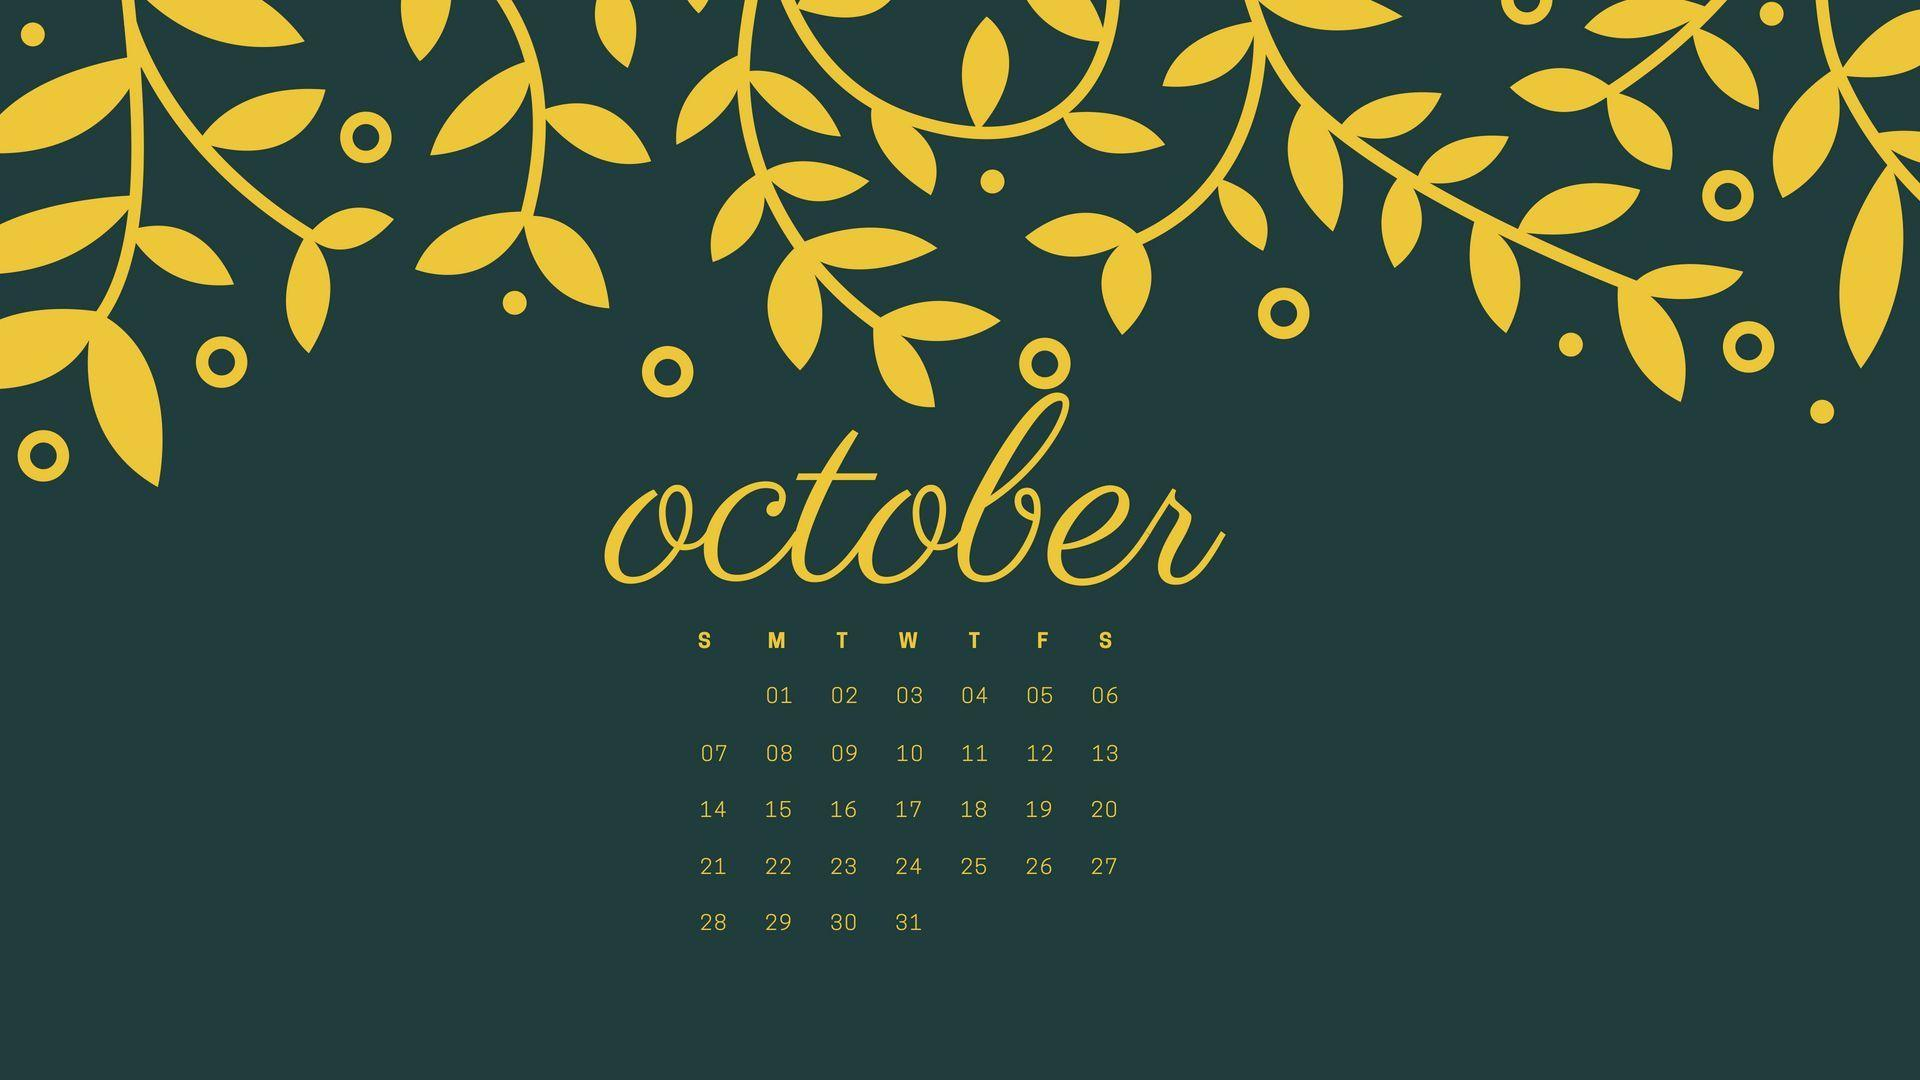 October 2018 Calendar Wallpapers